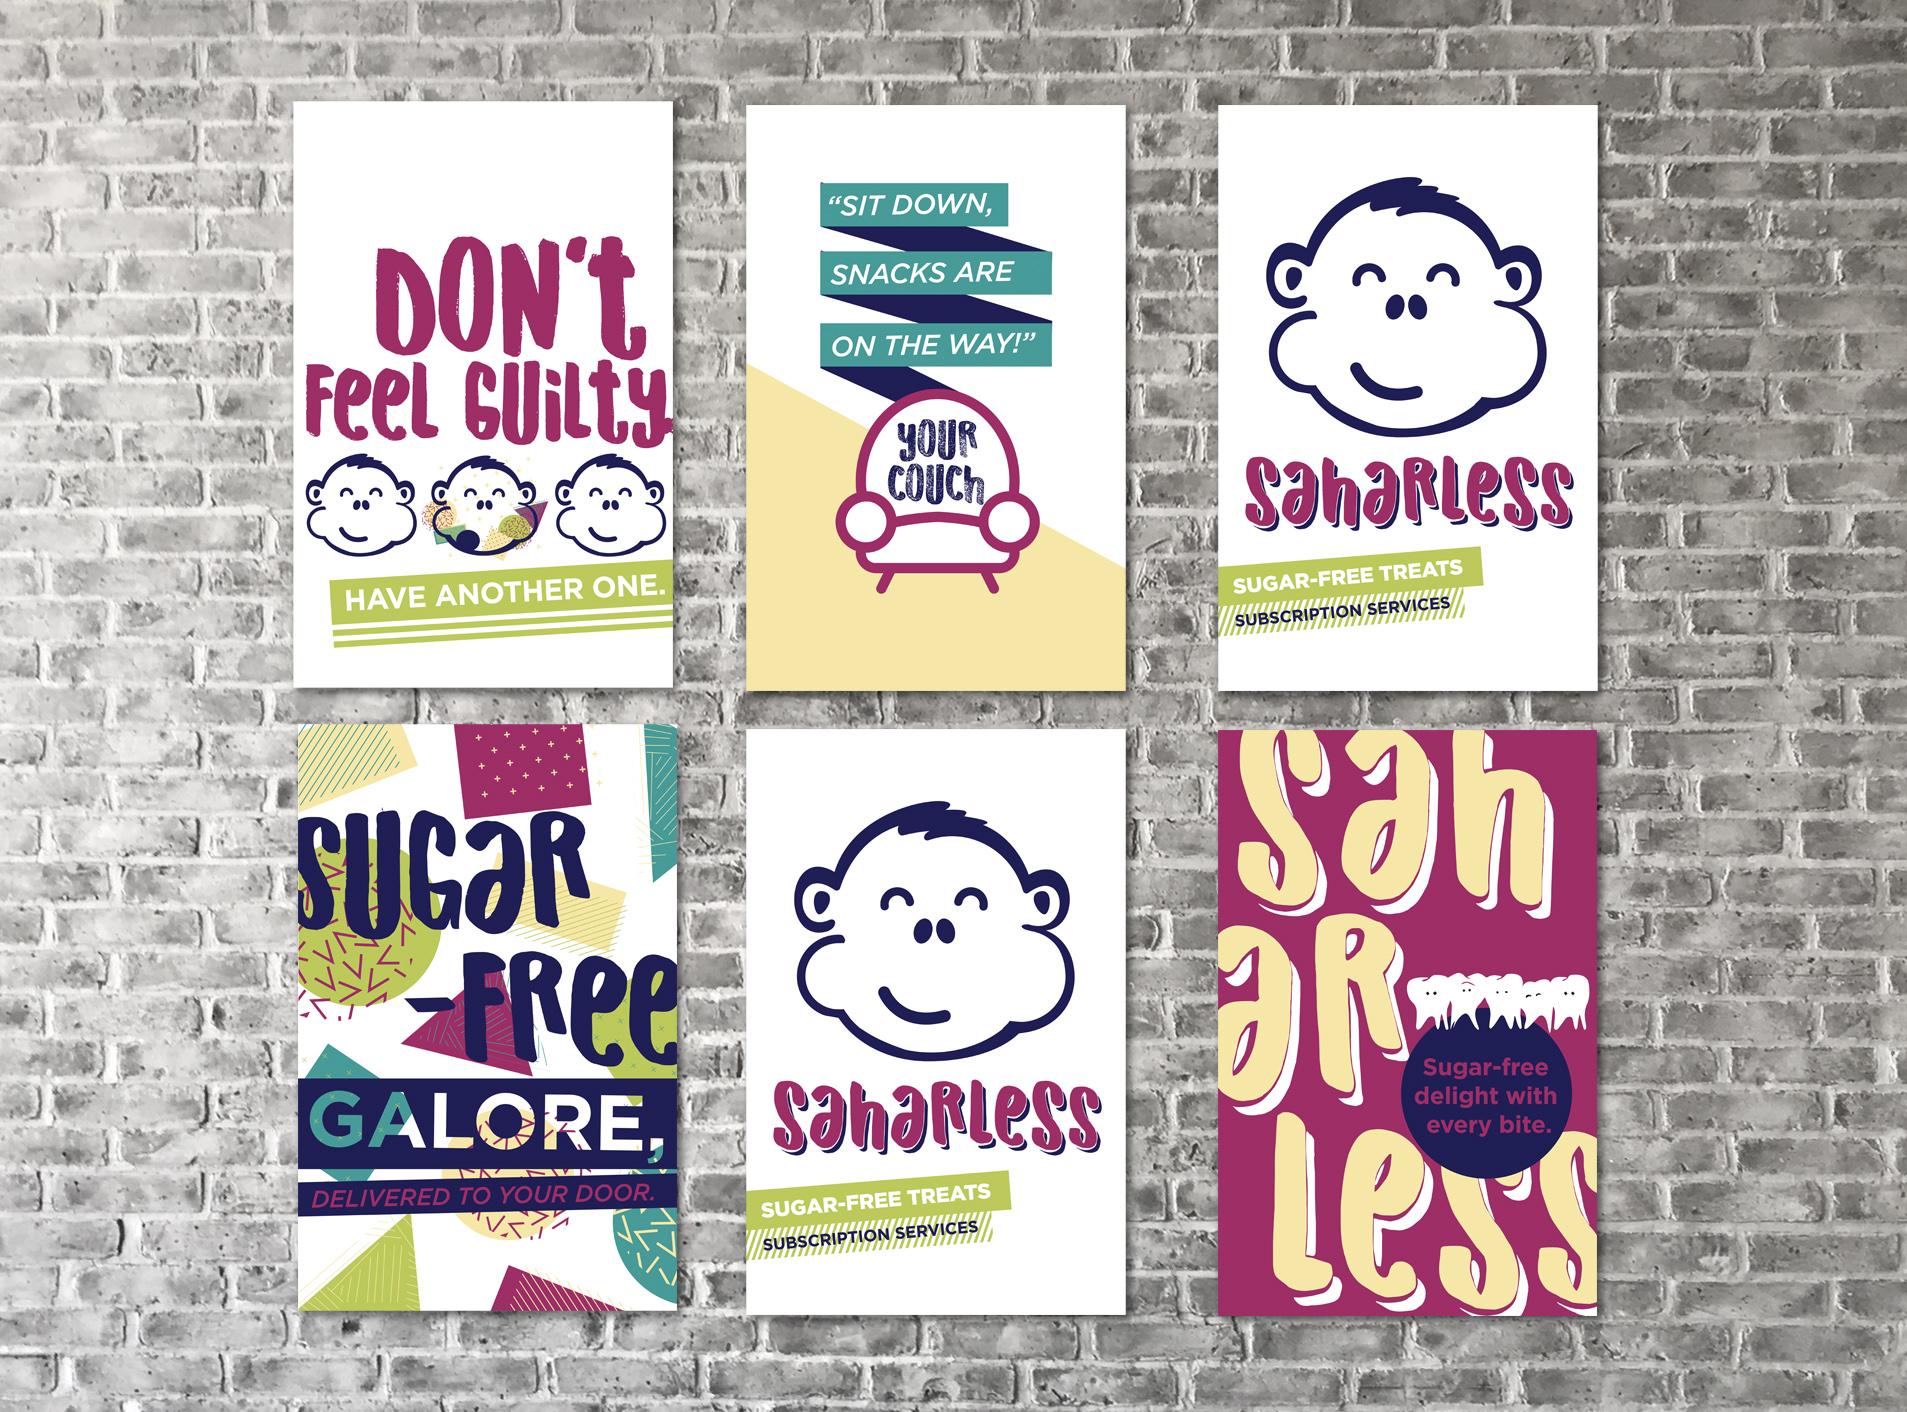 Saharless Outdoor Poster Series